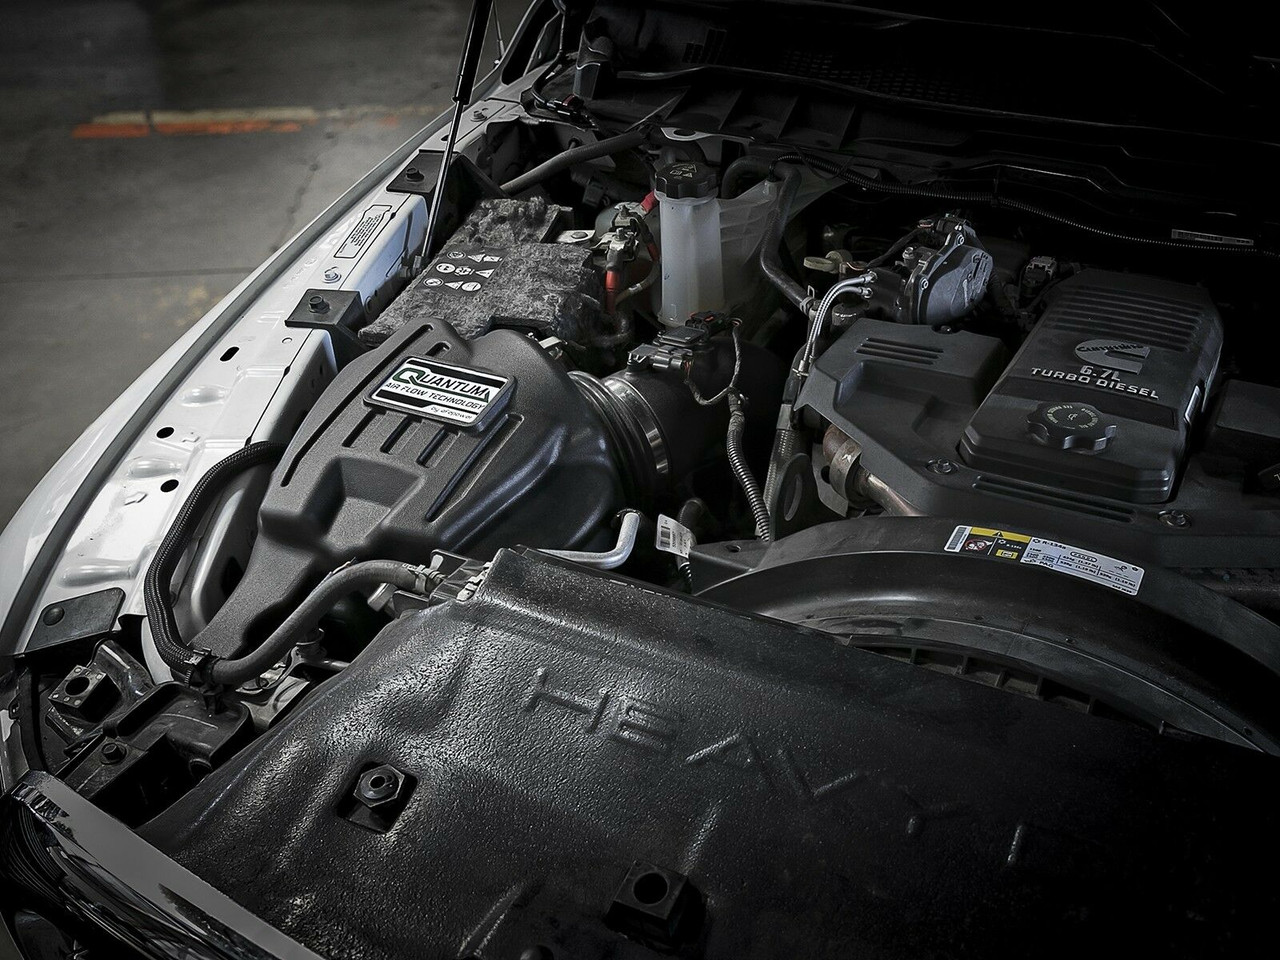 AFE AIR INTAKE FOR 13-18 DODGE RAM CUMMINS DIESEL 6.7L QUANTUM PRO 5R 53-10002R